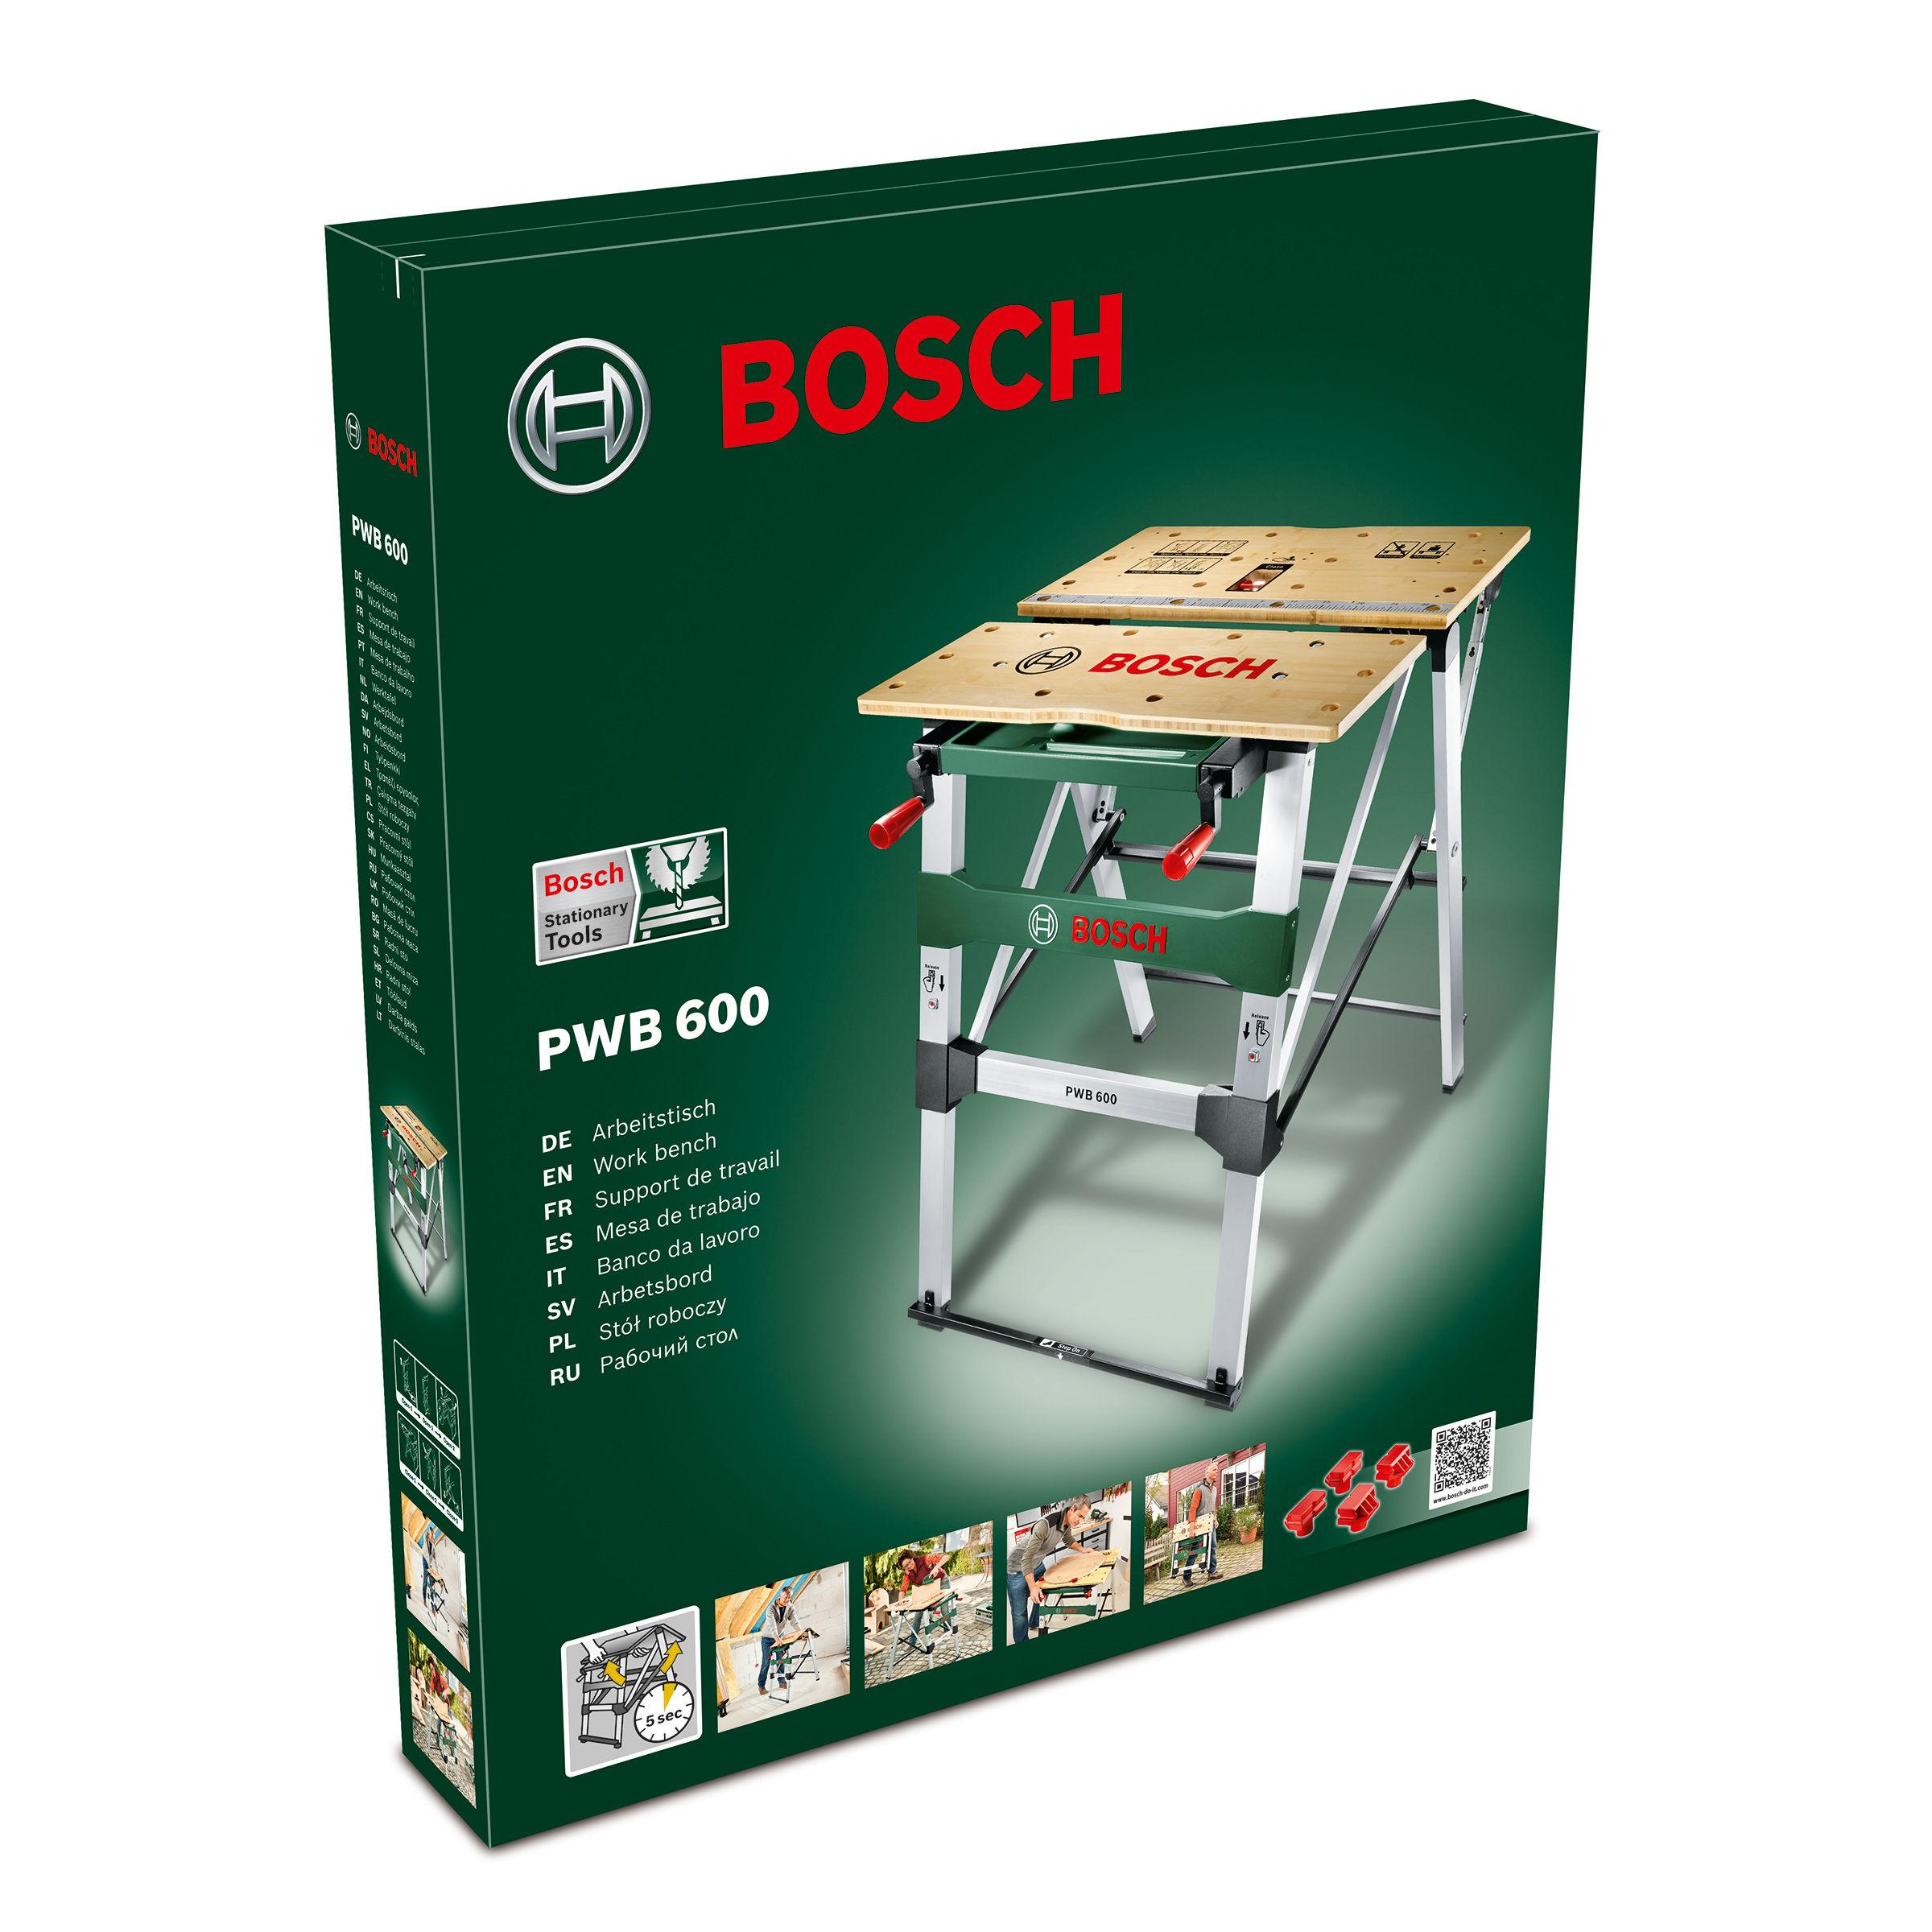 toolstop bosch pwb600 mobile work bench. Black Bedroom Furniture Sets. Home Design Ideas